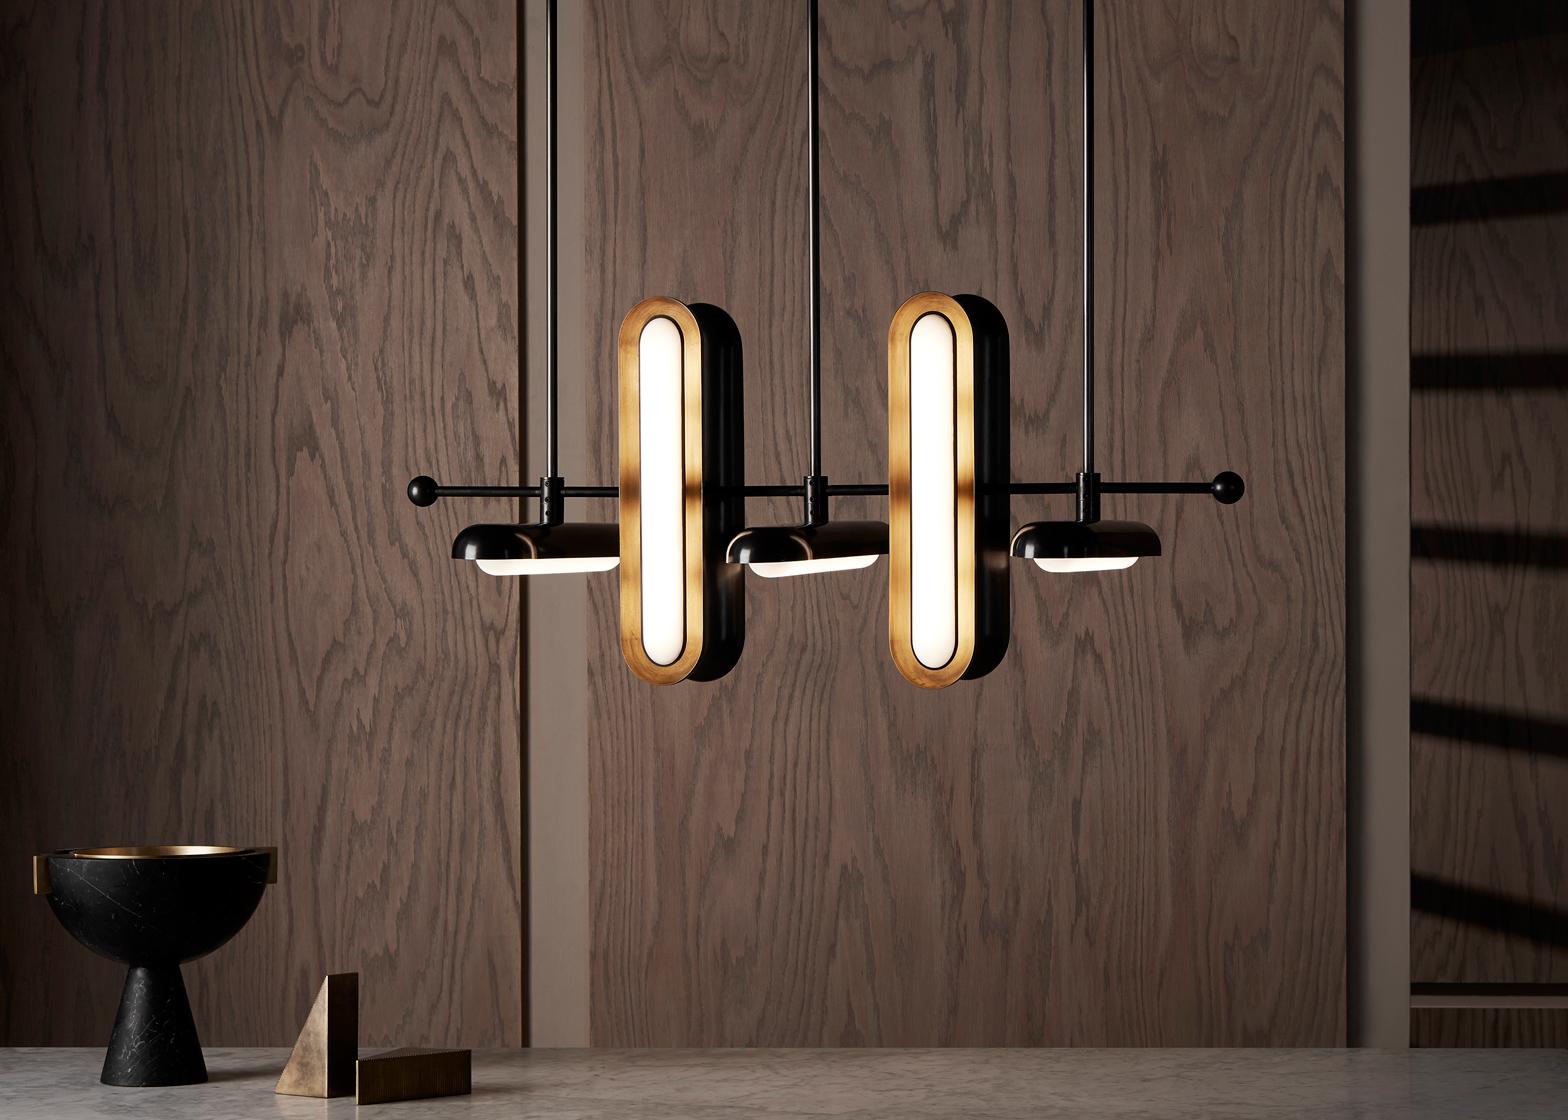 Circuit lamp by Apparatus